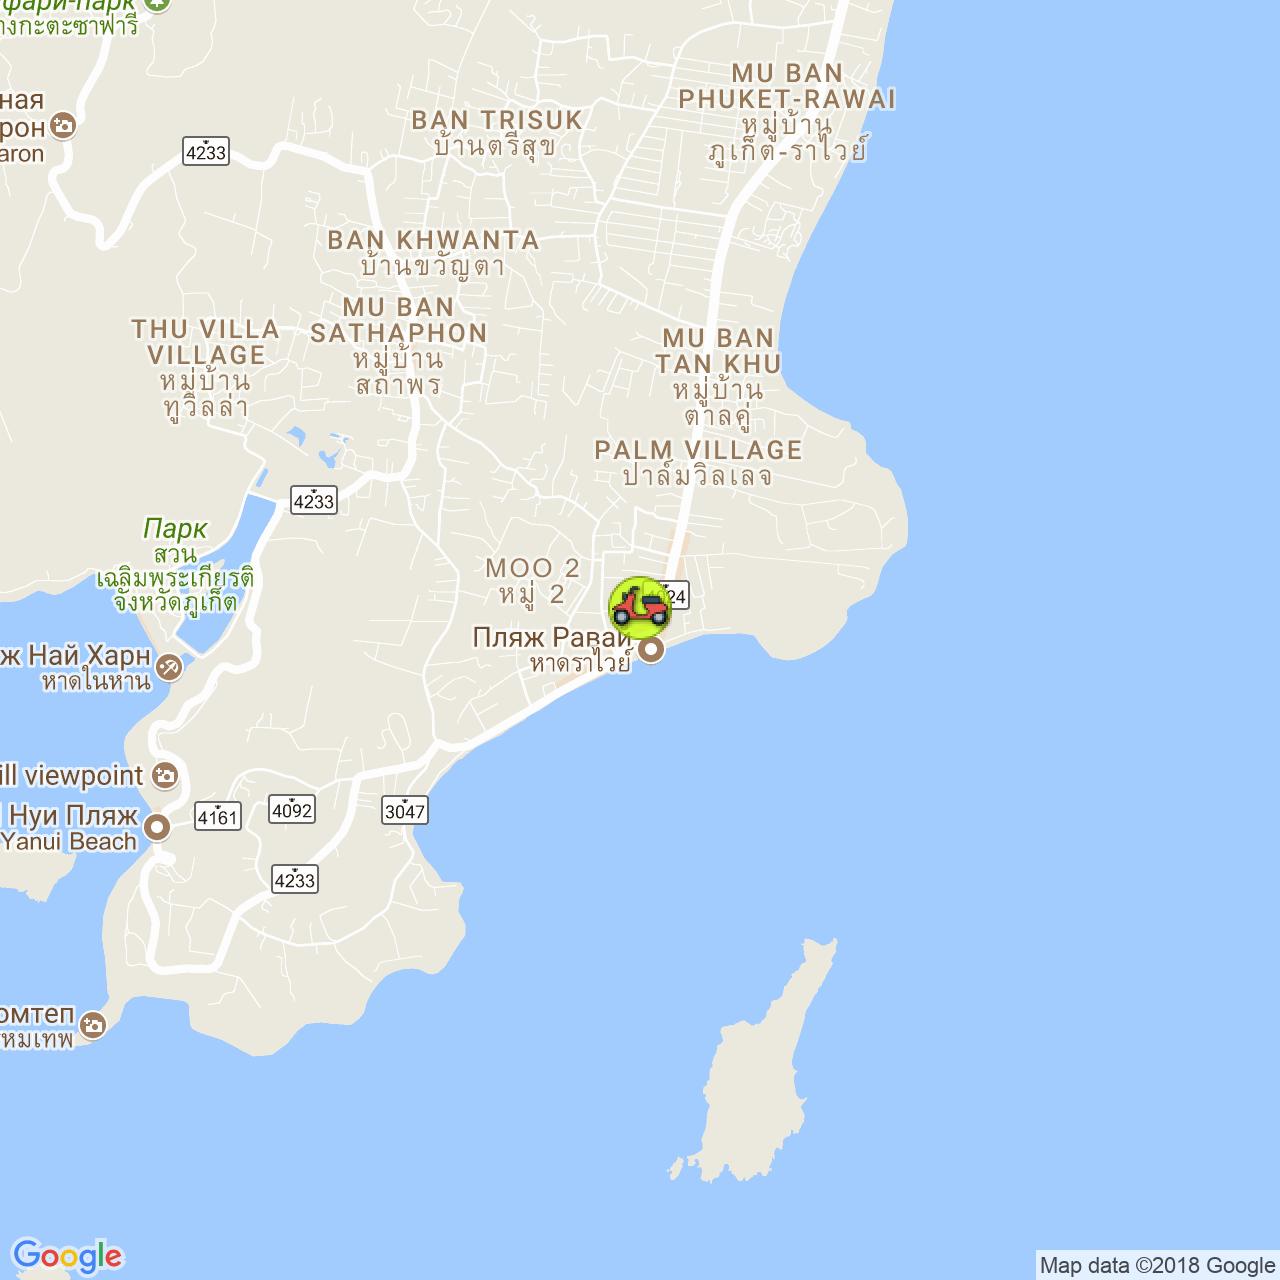 Аренда байков на Раваи на карте Пхукета